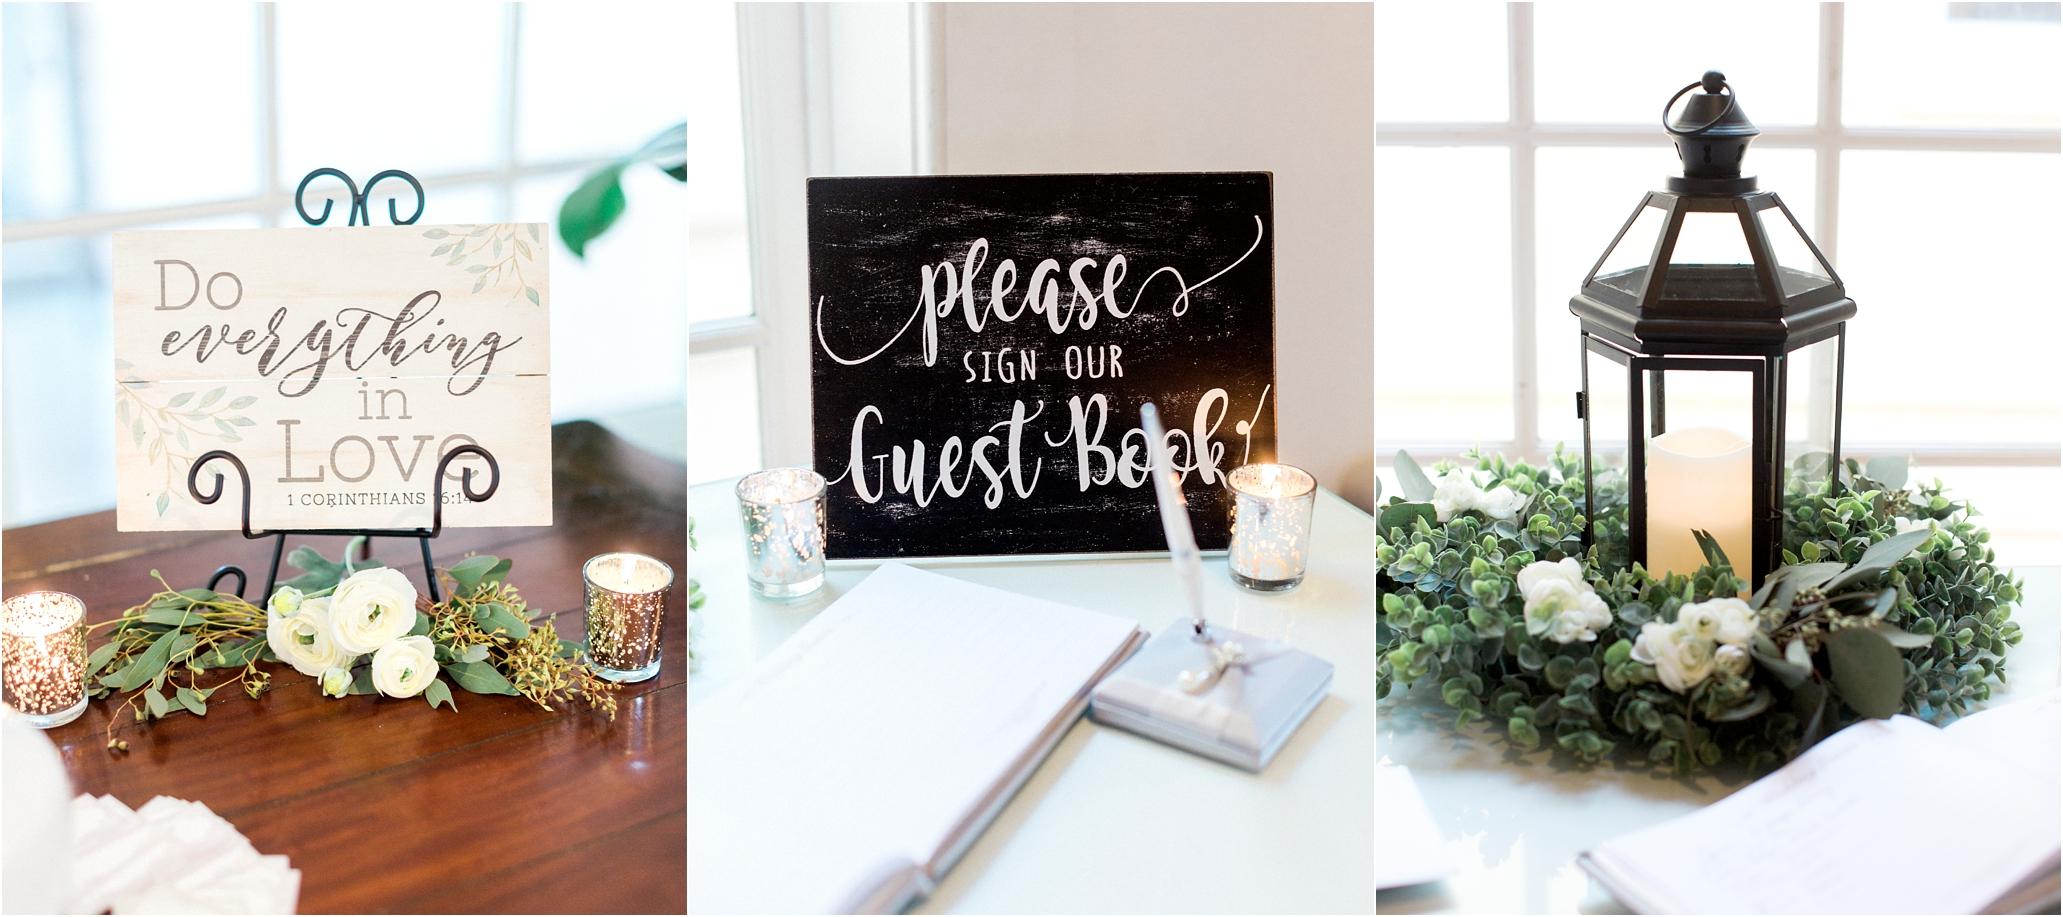 Lisa Silva Photography- Ponte Vedra Beach and Jacksonville, Florida Fine Art Film Wedding Photography- Wedding at The White Room Villa Blanca in St. Augustine, Florida_0044.jpg